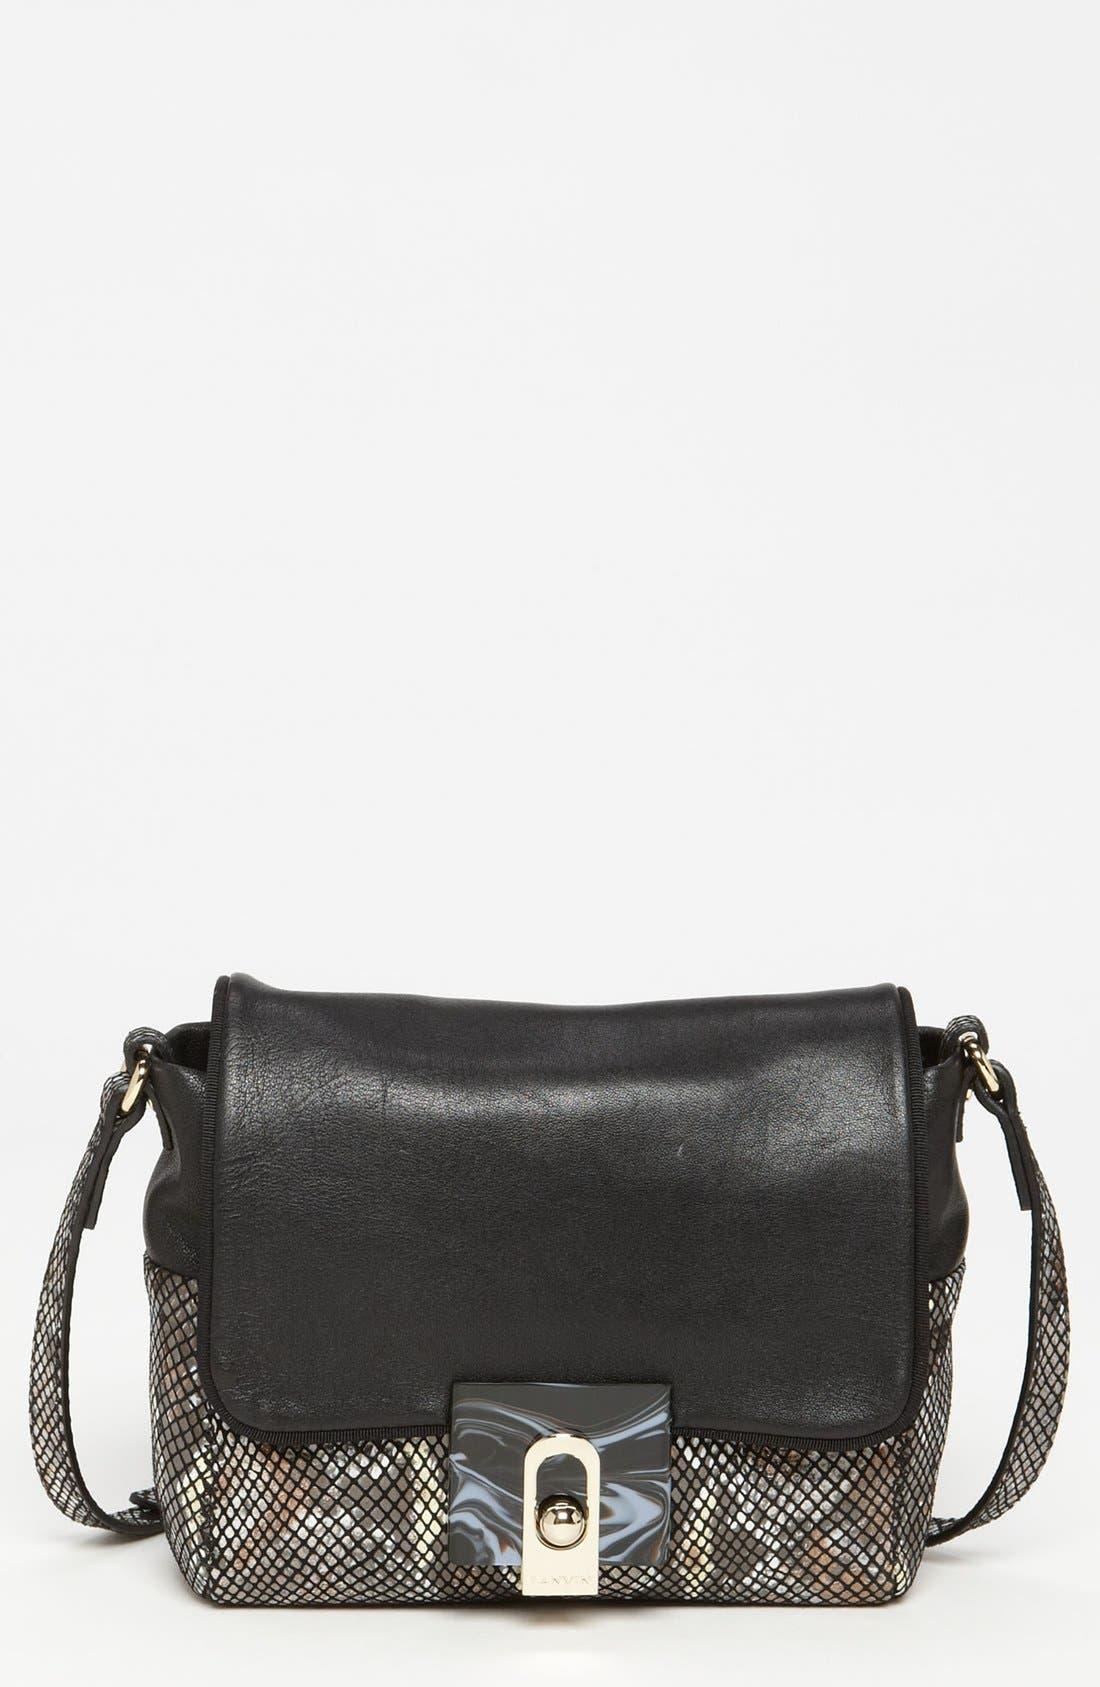 Alternate Image 1 Selected - Lanvin 'For Me - Small' Faux Snakeskin Crossbody Bag